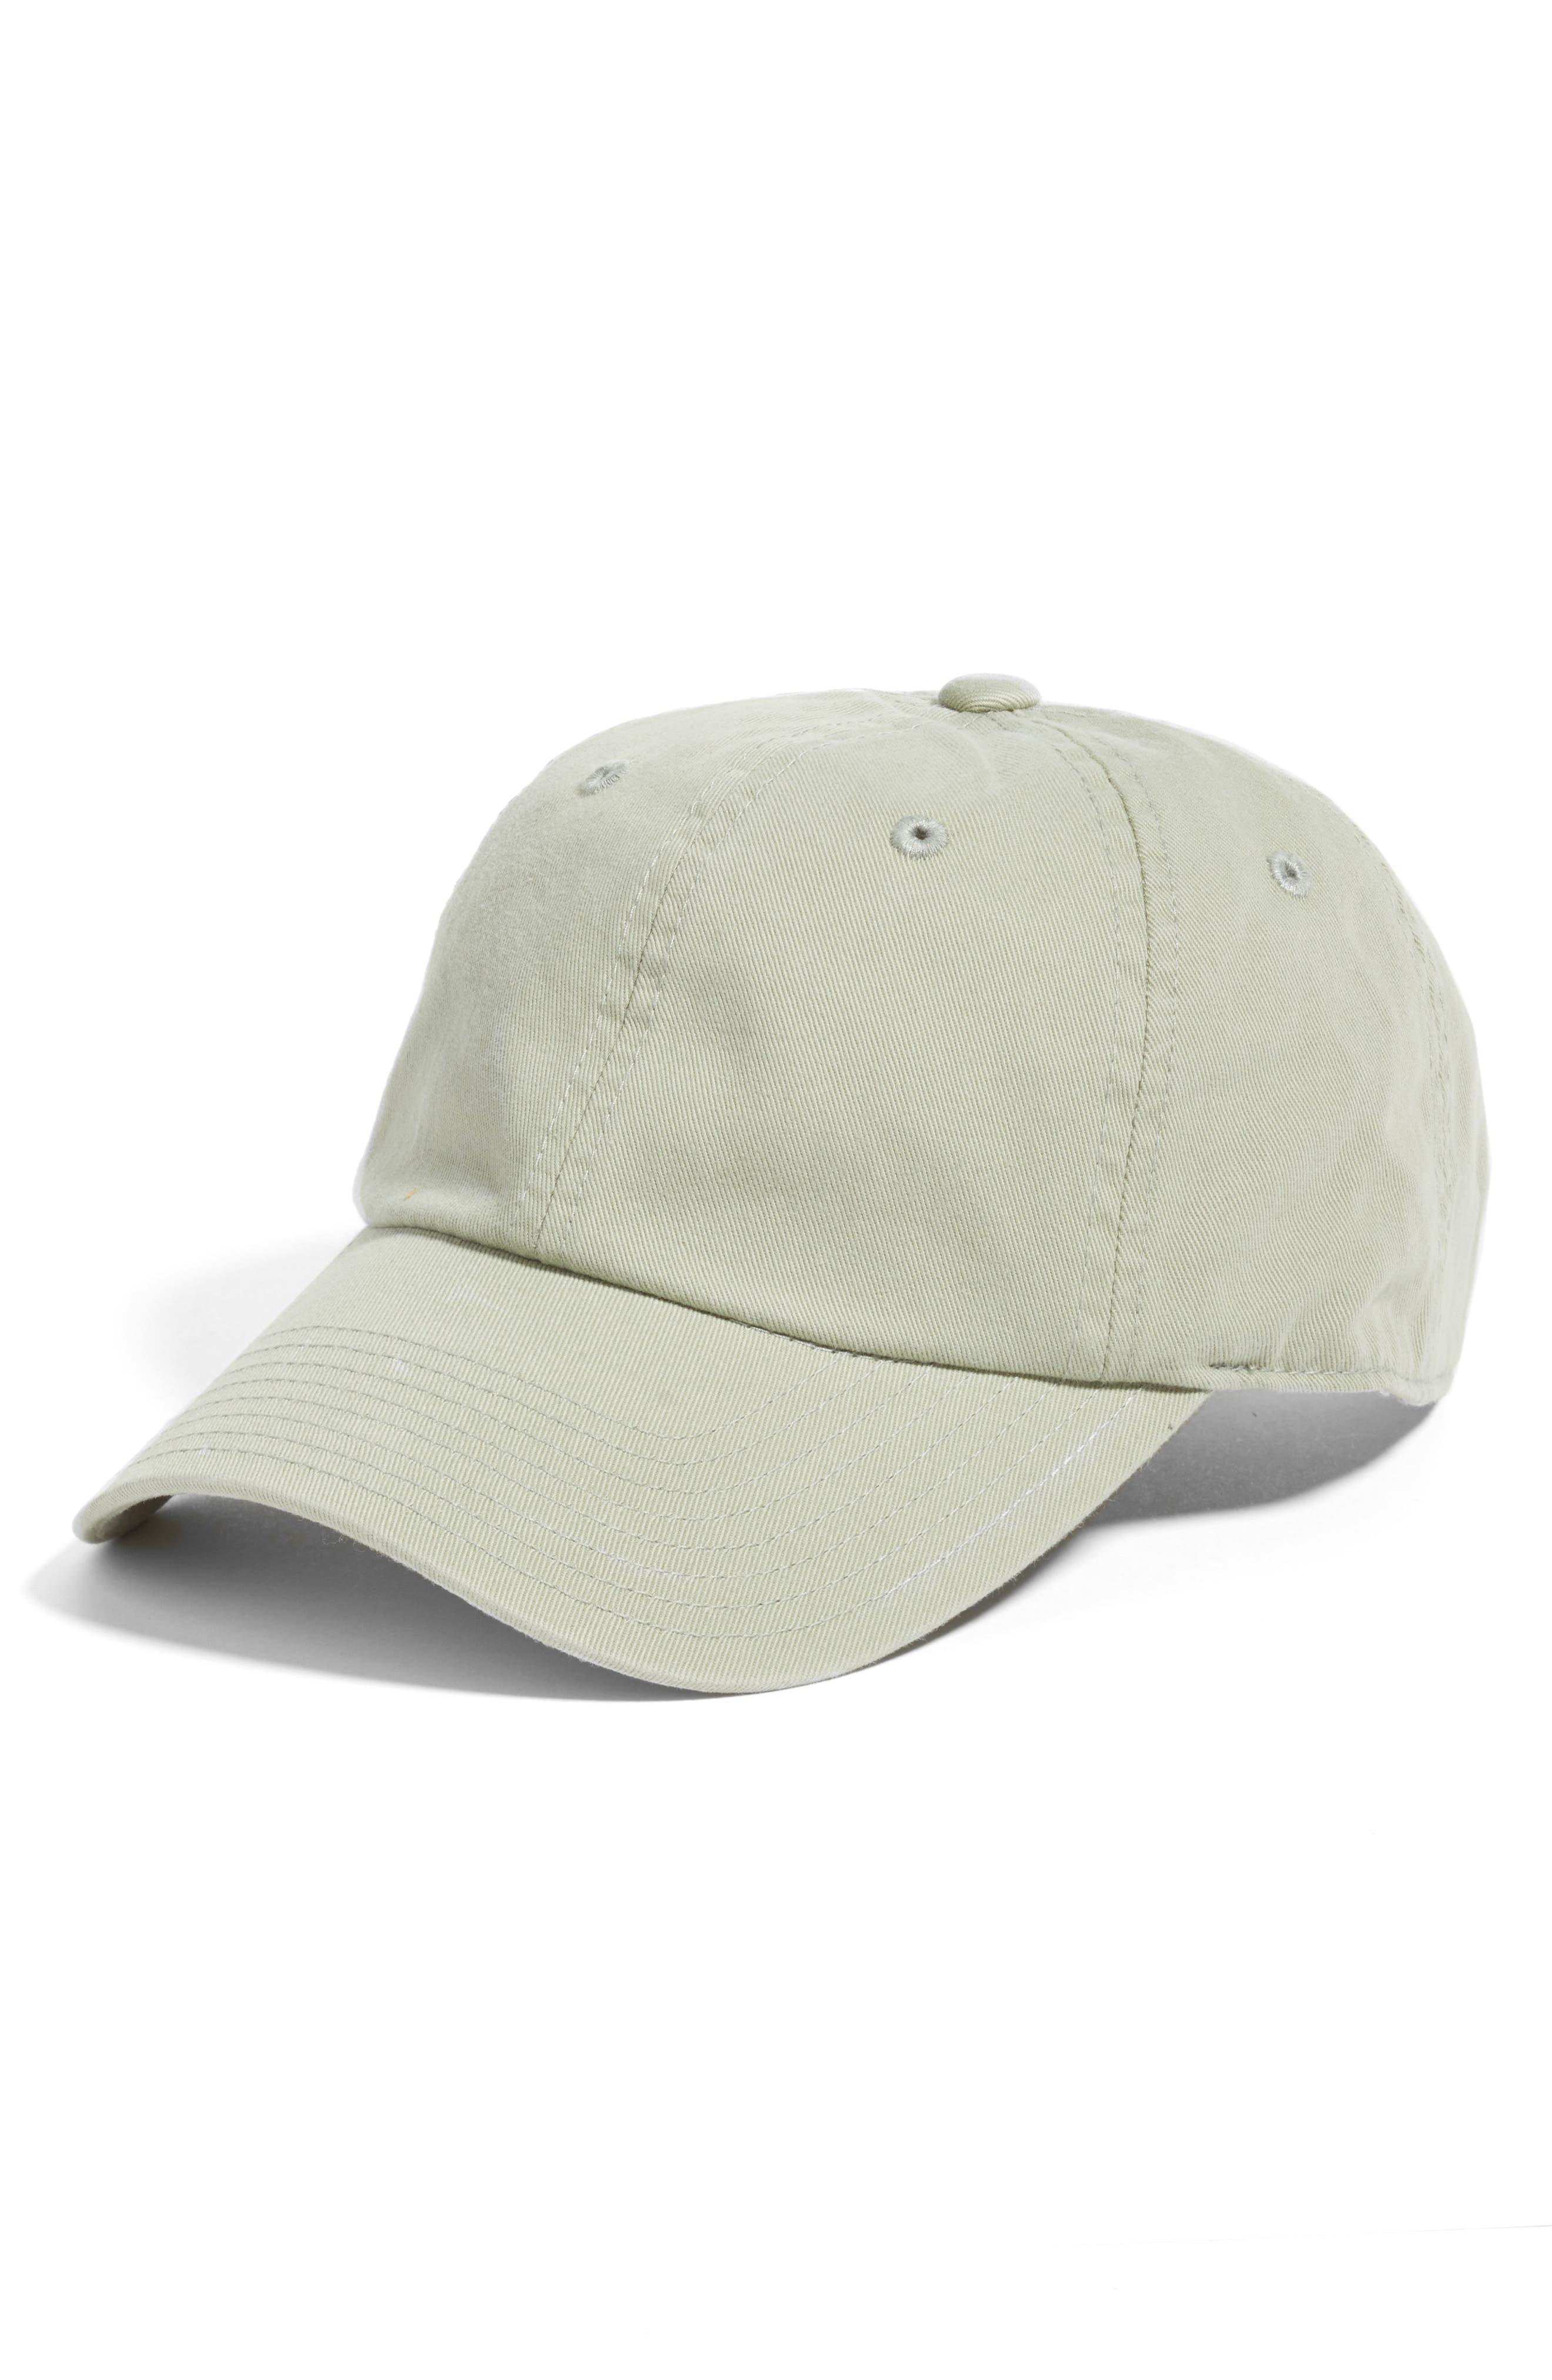 Main Image - American Needle Washed Cotton Baseball Cap